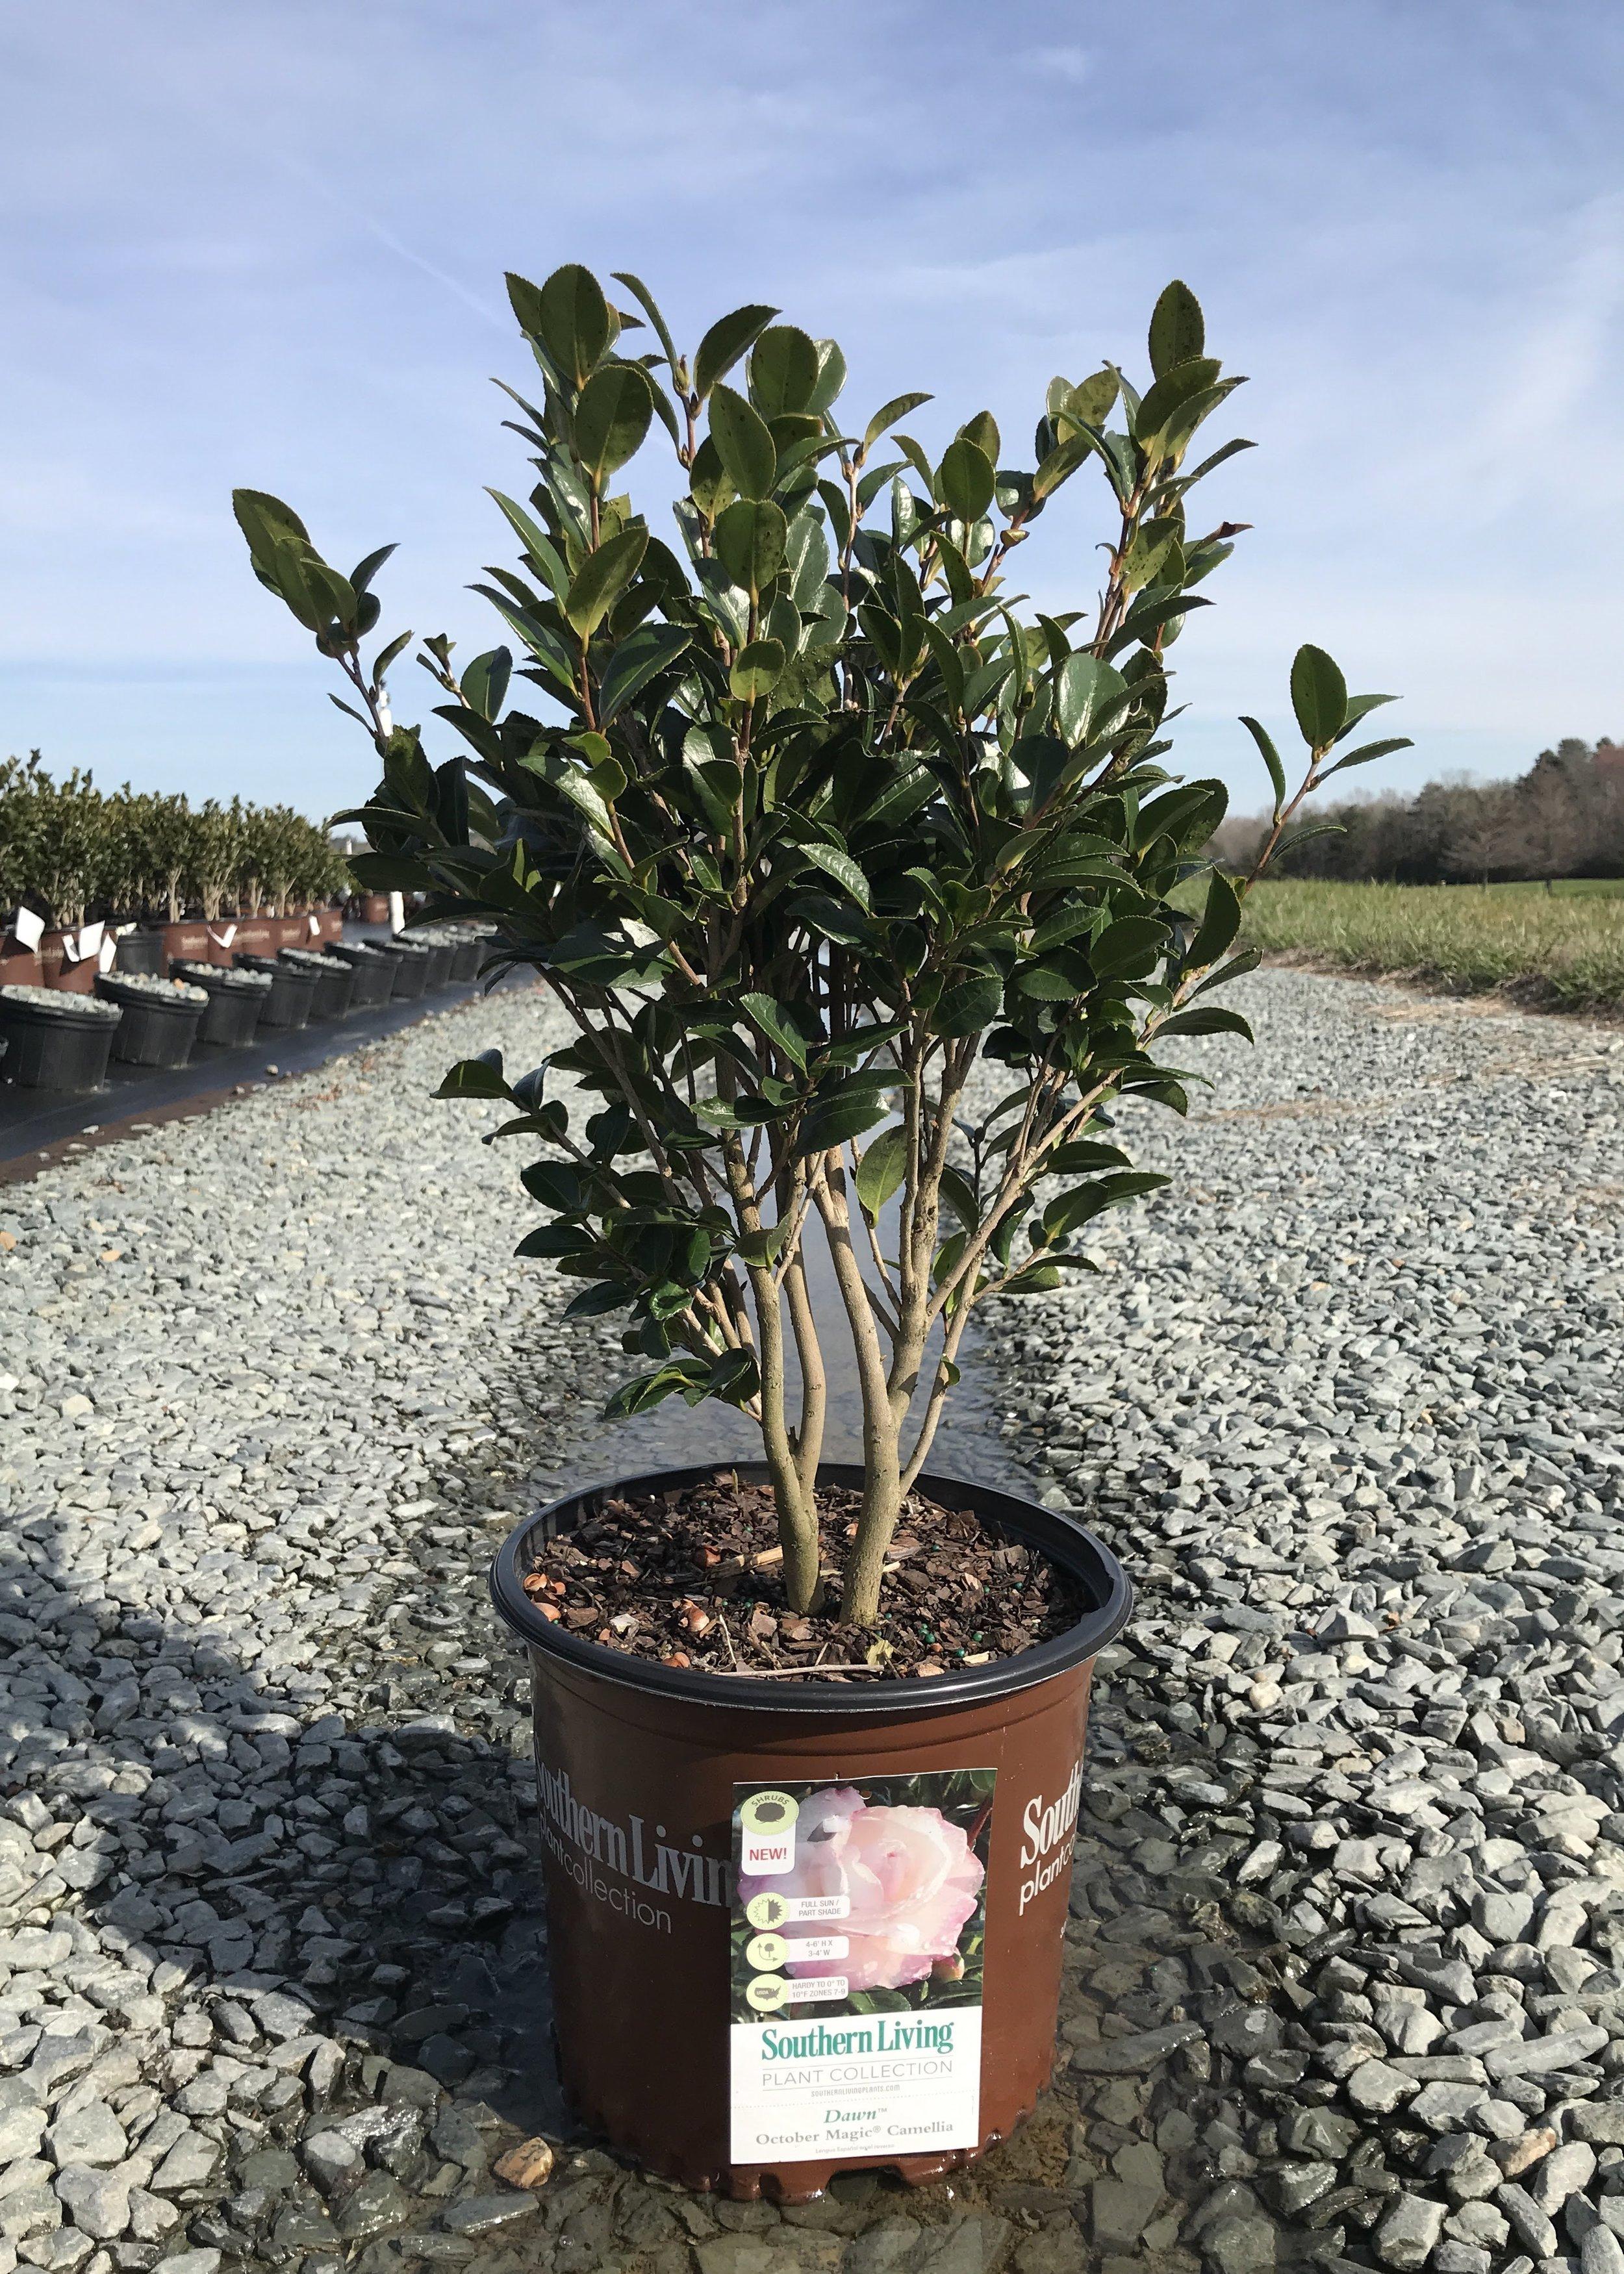 Camellia sasanqua 'OM Dawn' 3 gallon